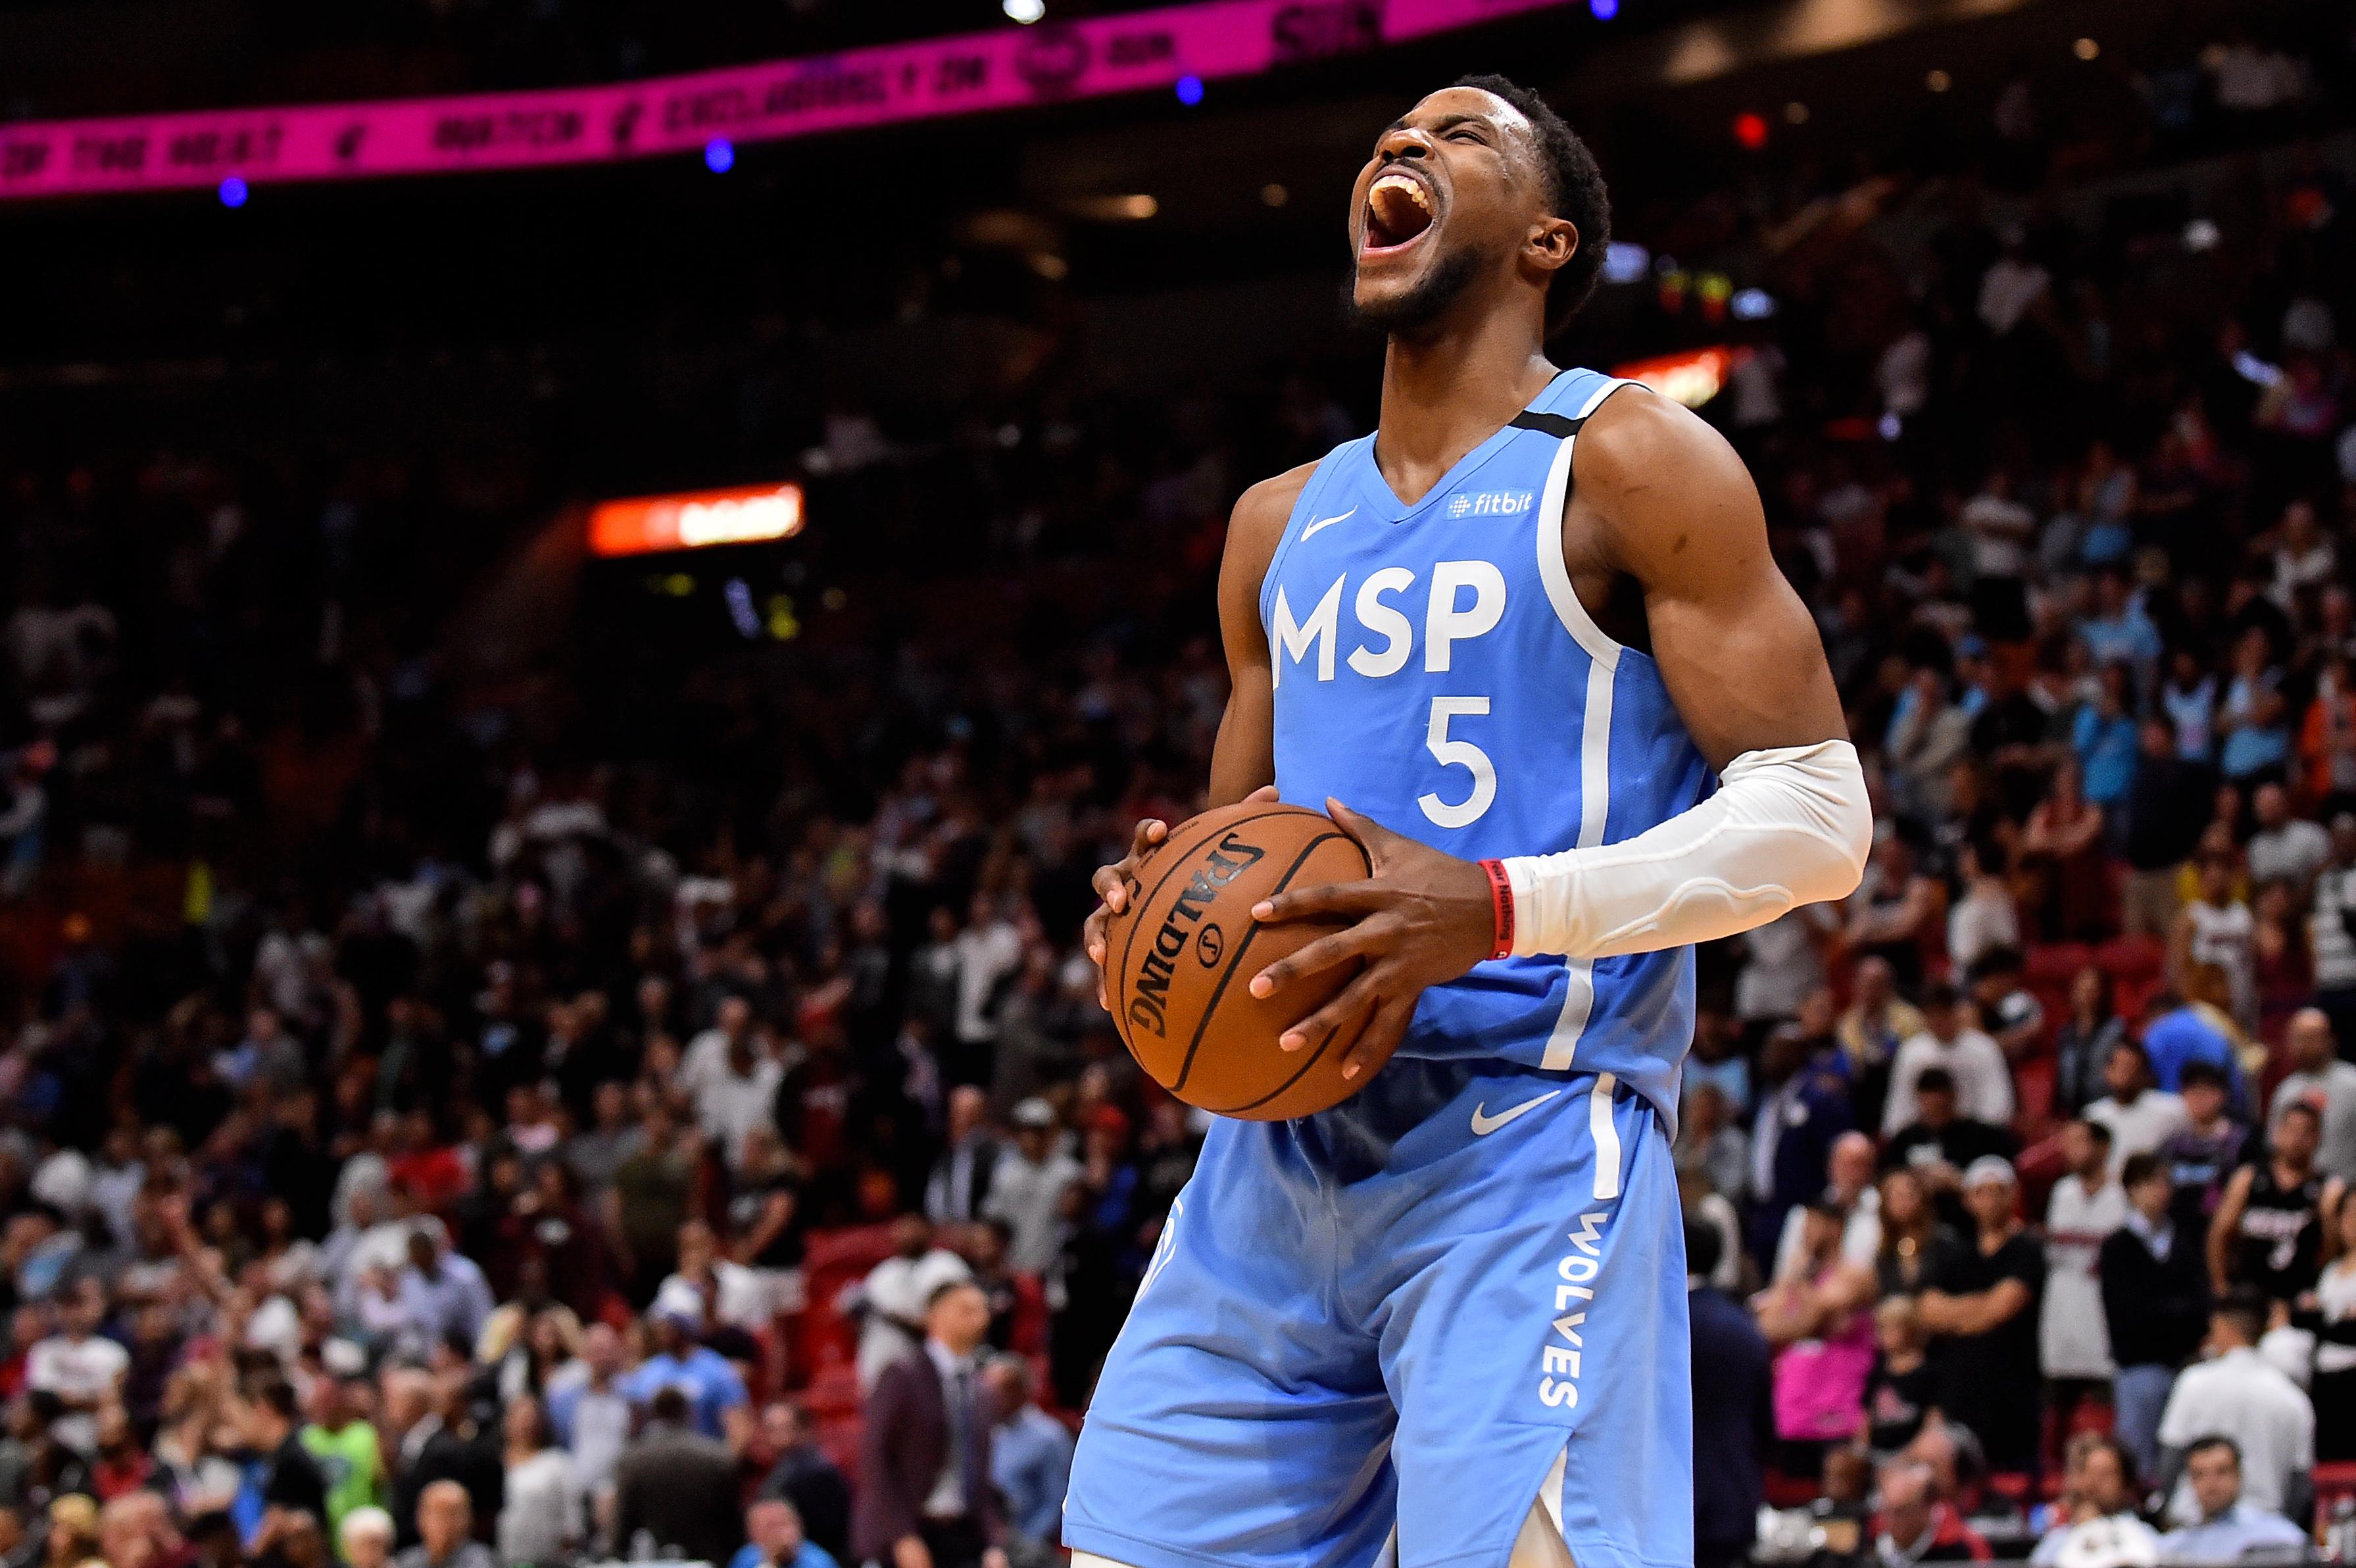 NBA: Minnesota Timberwolves at Miami Heat